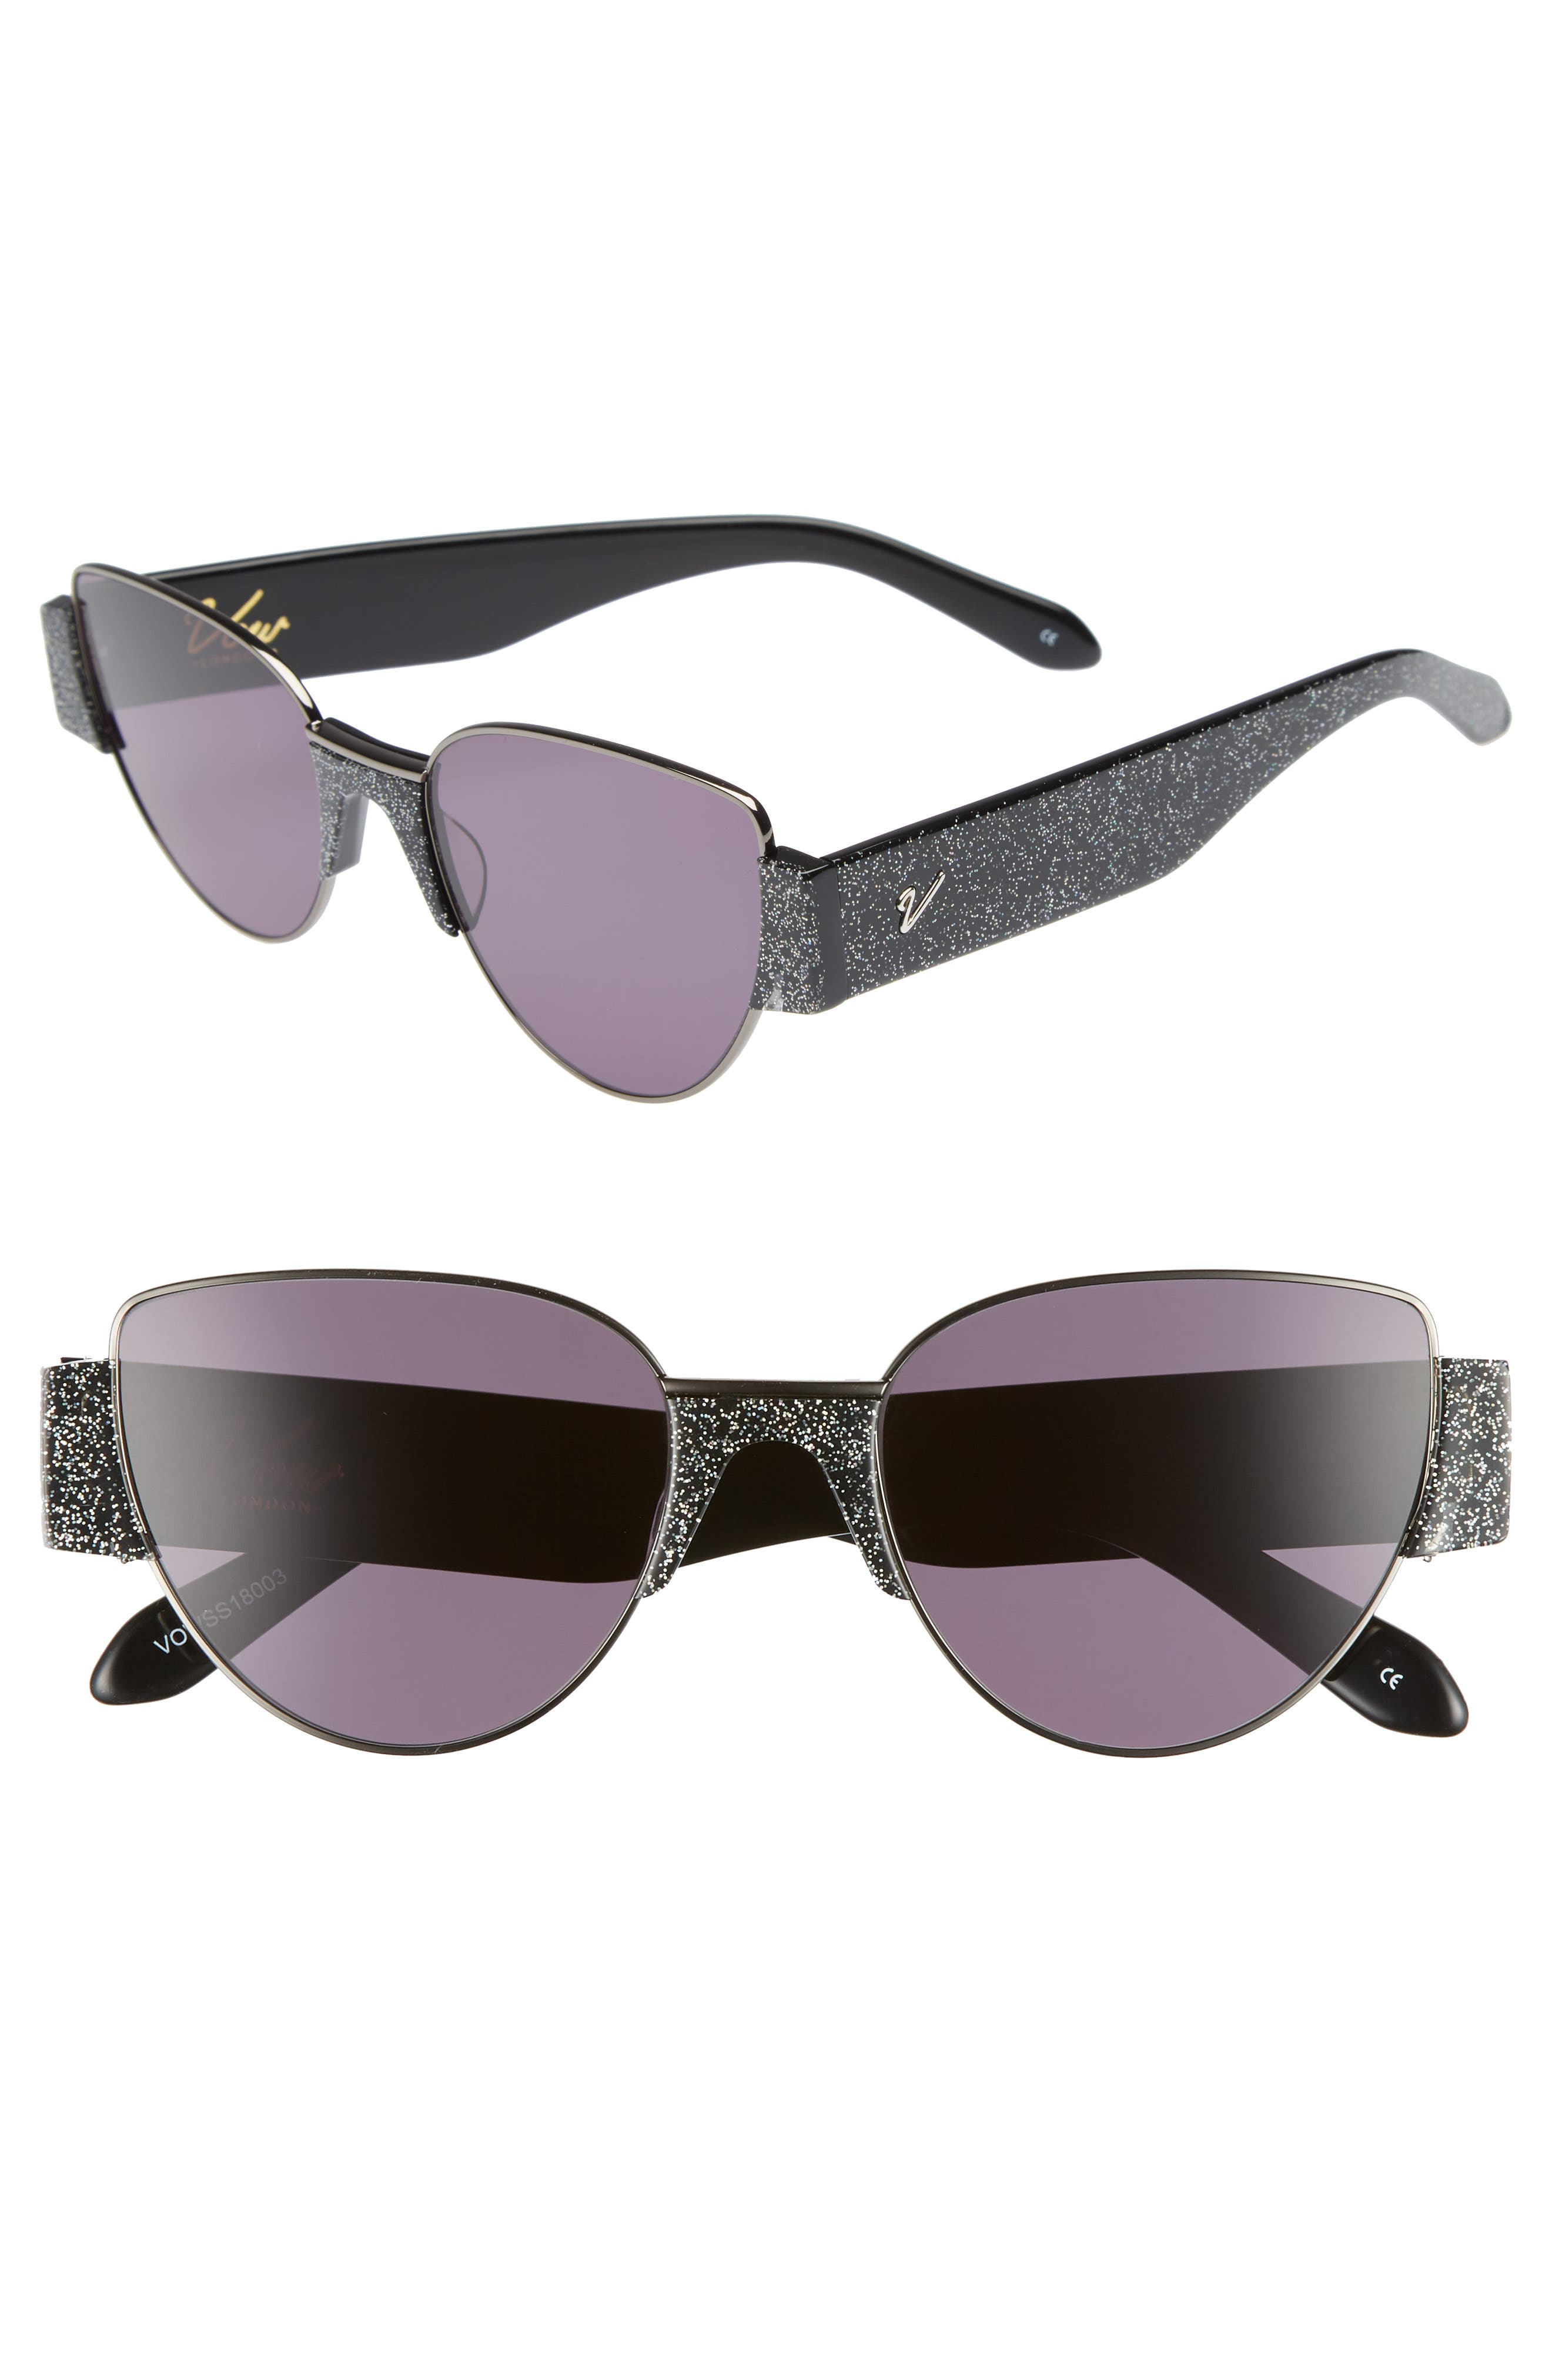 Dahlia 55mm Cat Eye Sunglasses,                             Main thumbnail 1, color,                             MULTI GLITTER/ GUNMETAL/ SMOKE